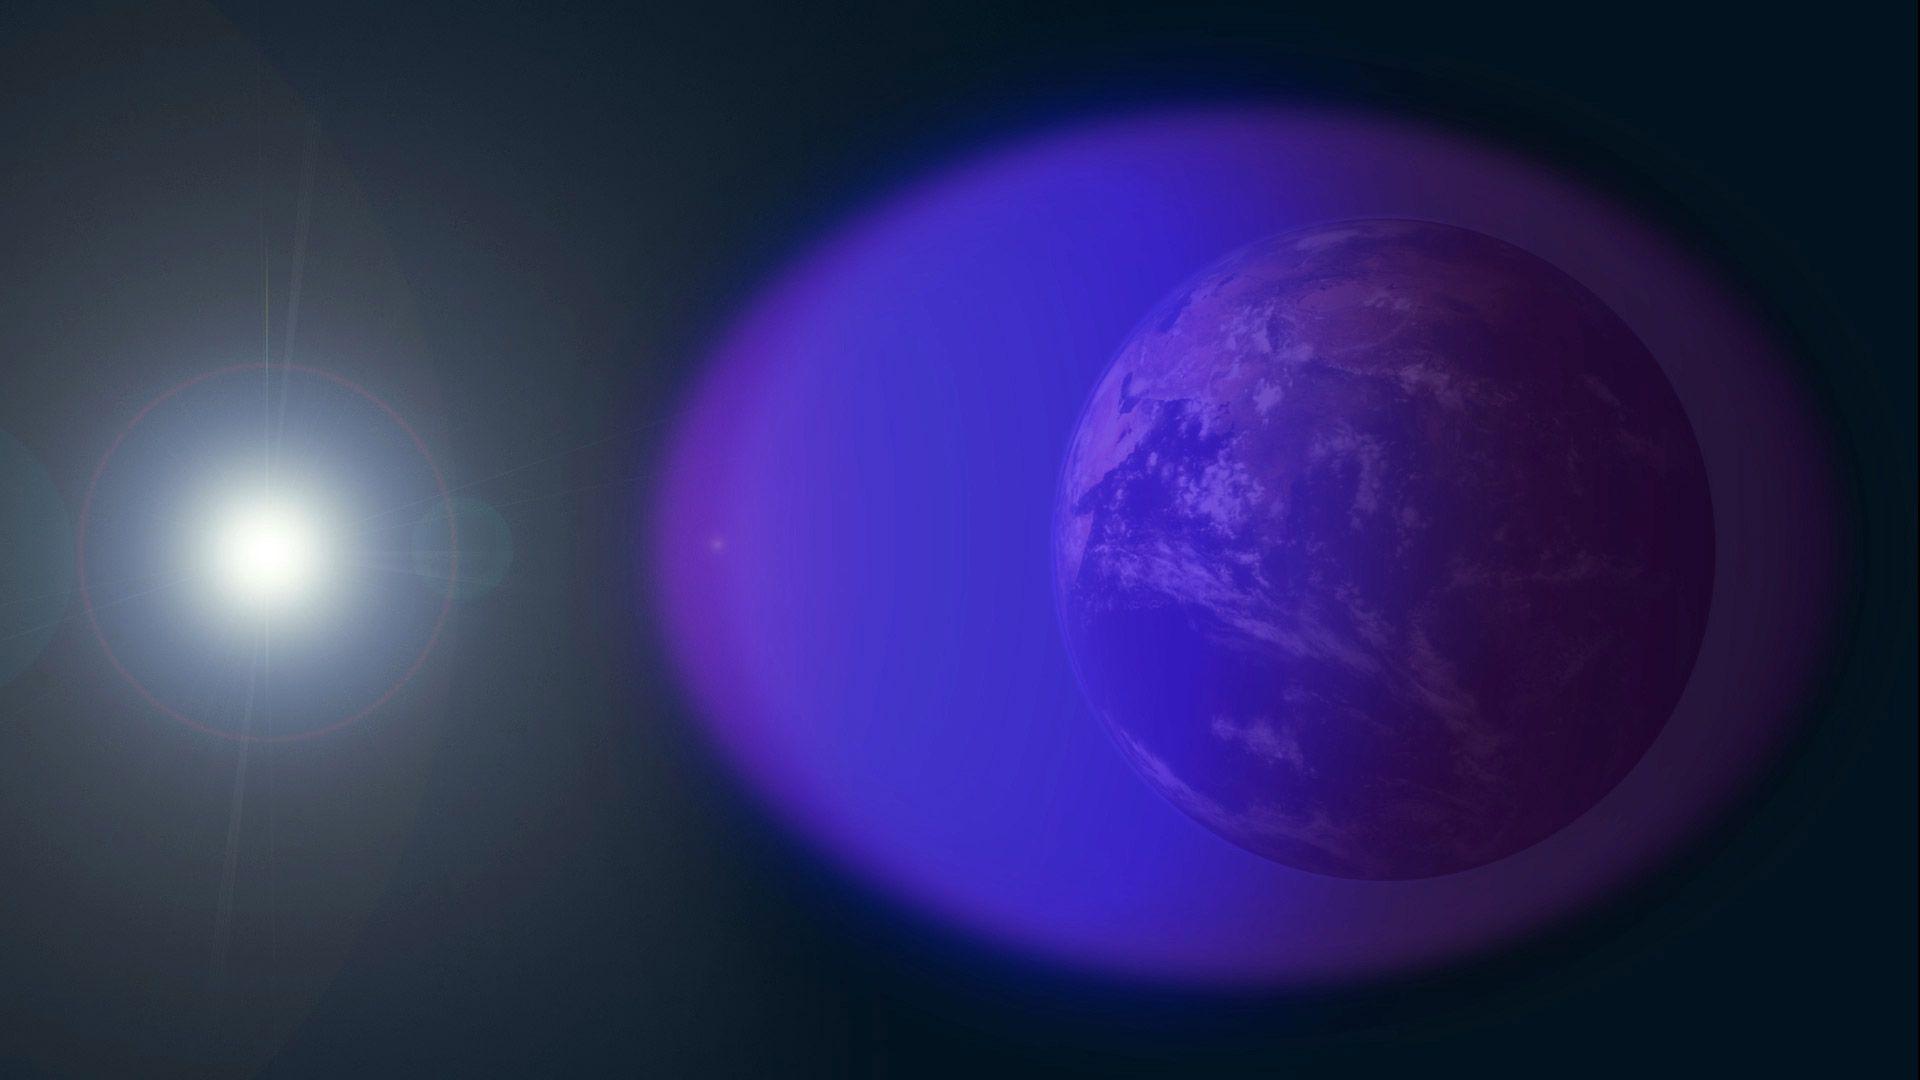 4fd32f0868_earth_ionosphere_illustration_nasa_gsfc_Duberstein